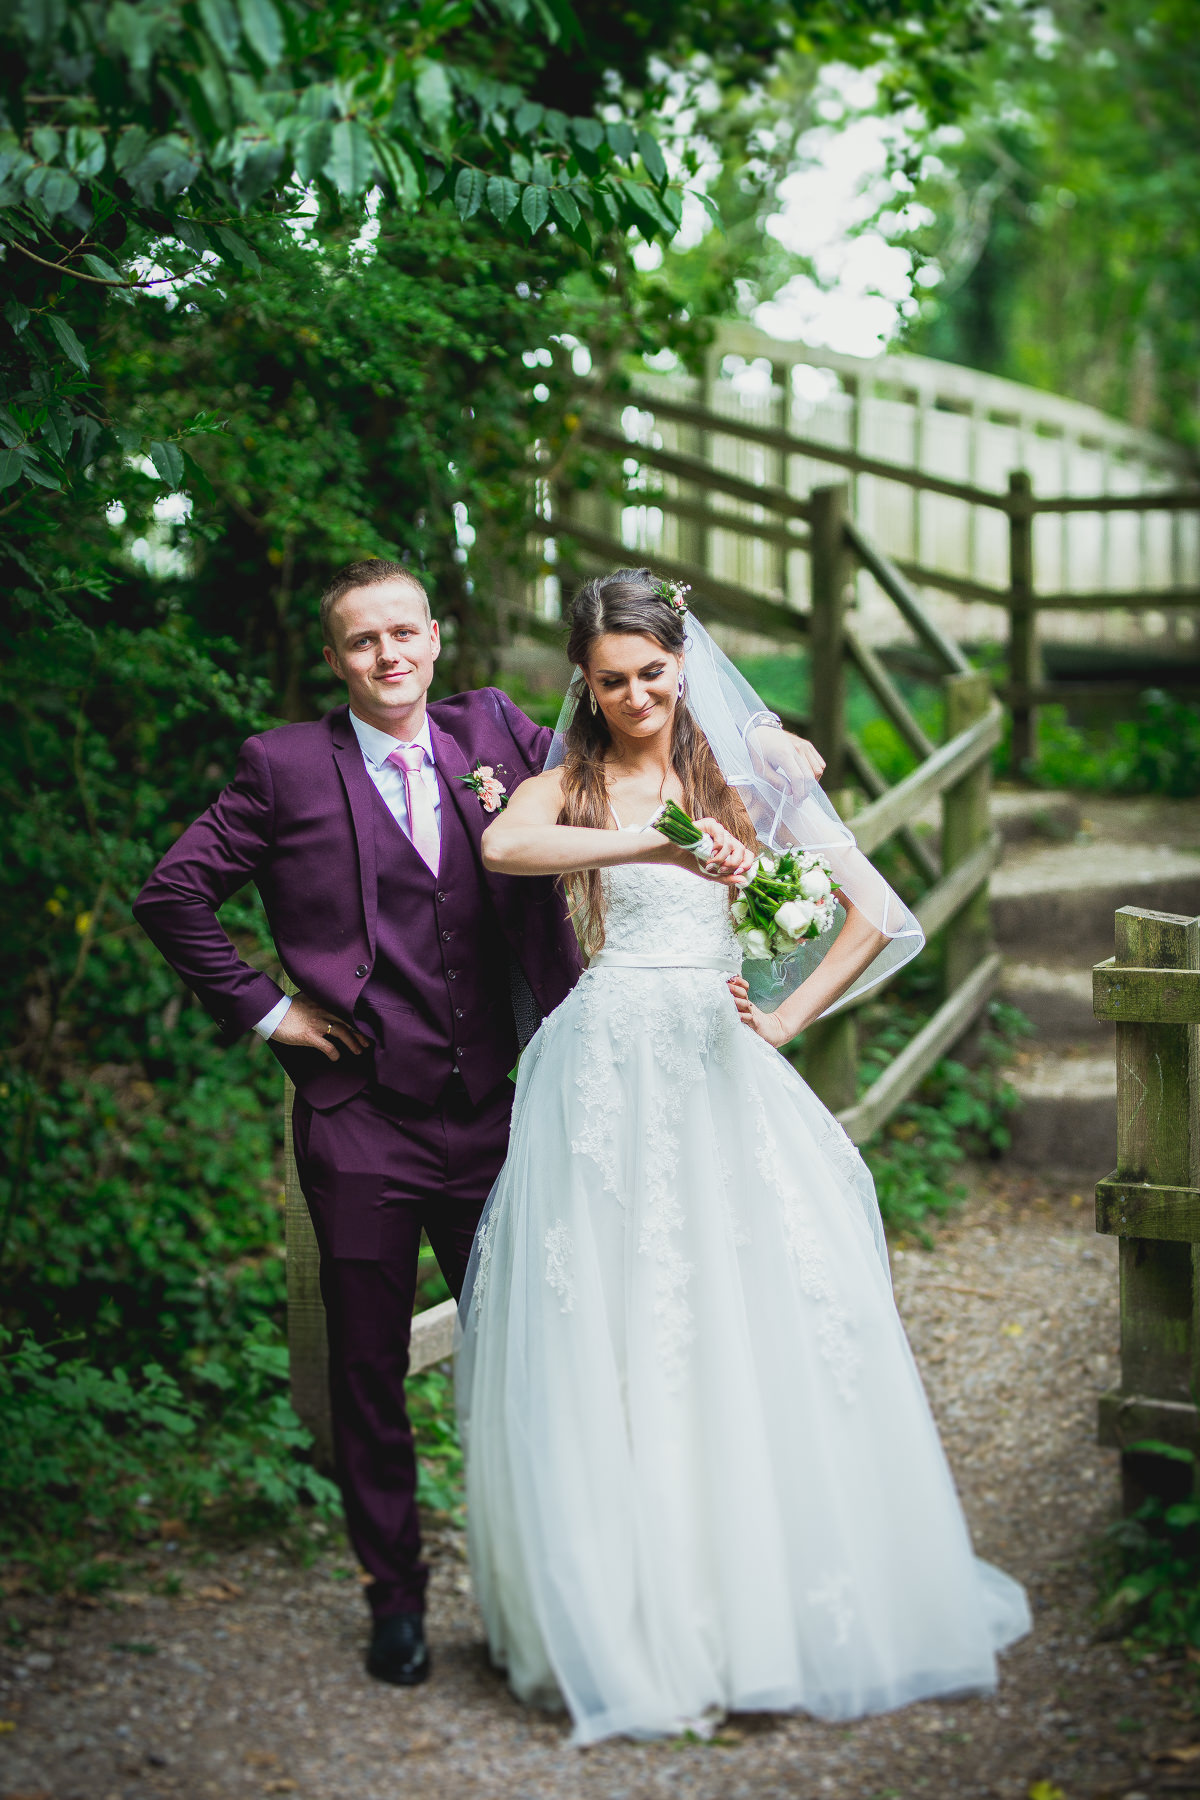 Dangira & Ignas Arundel Sussex Weddings 3.jpg